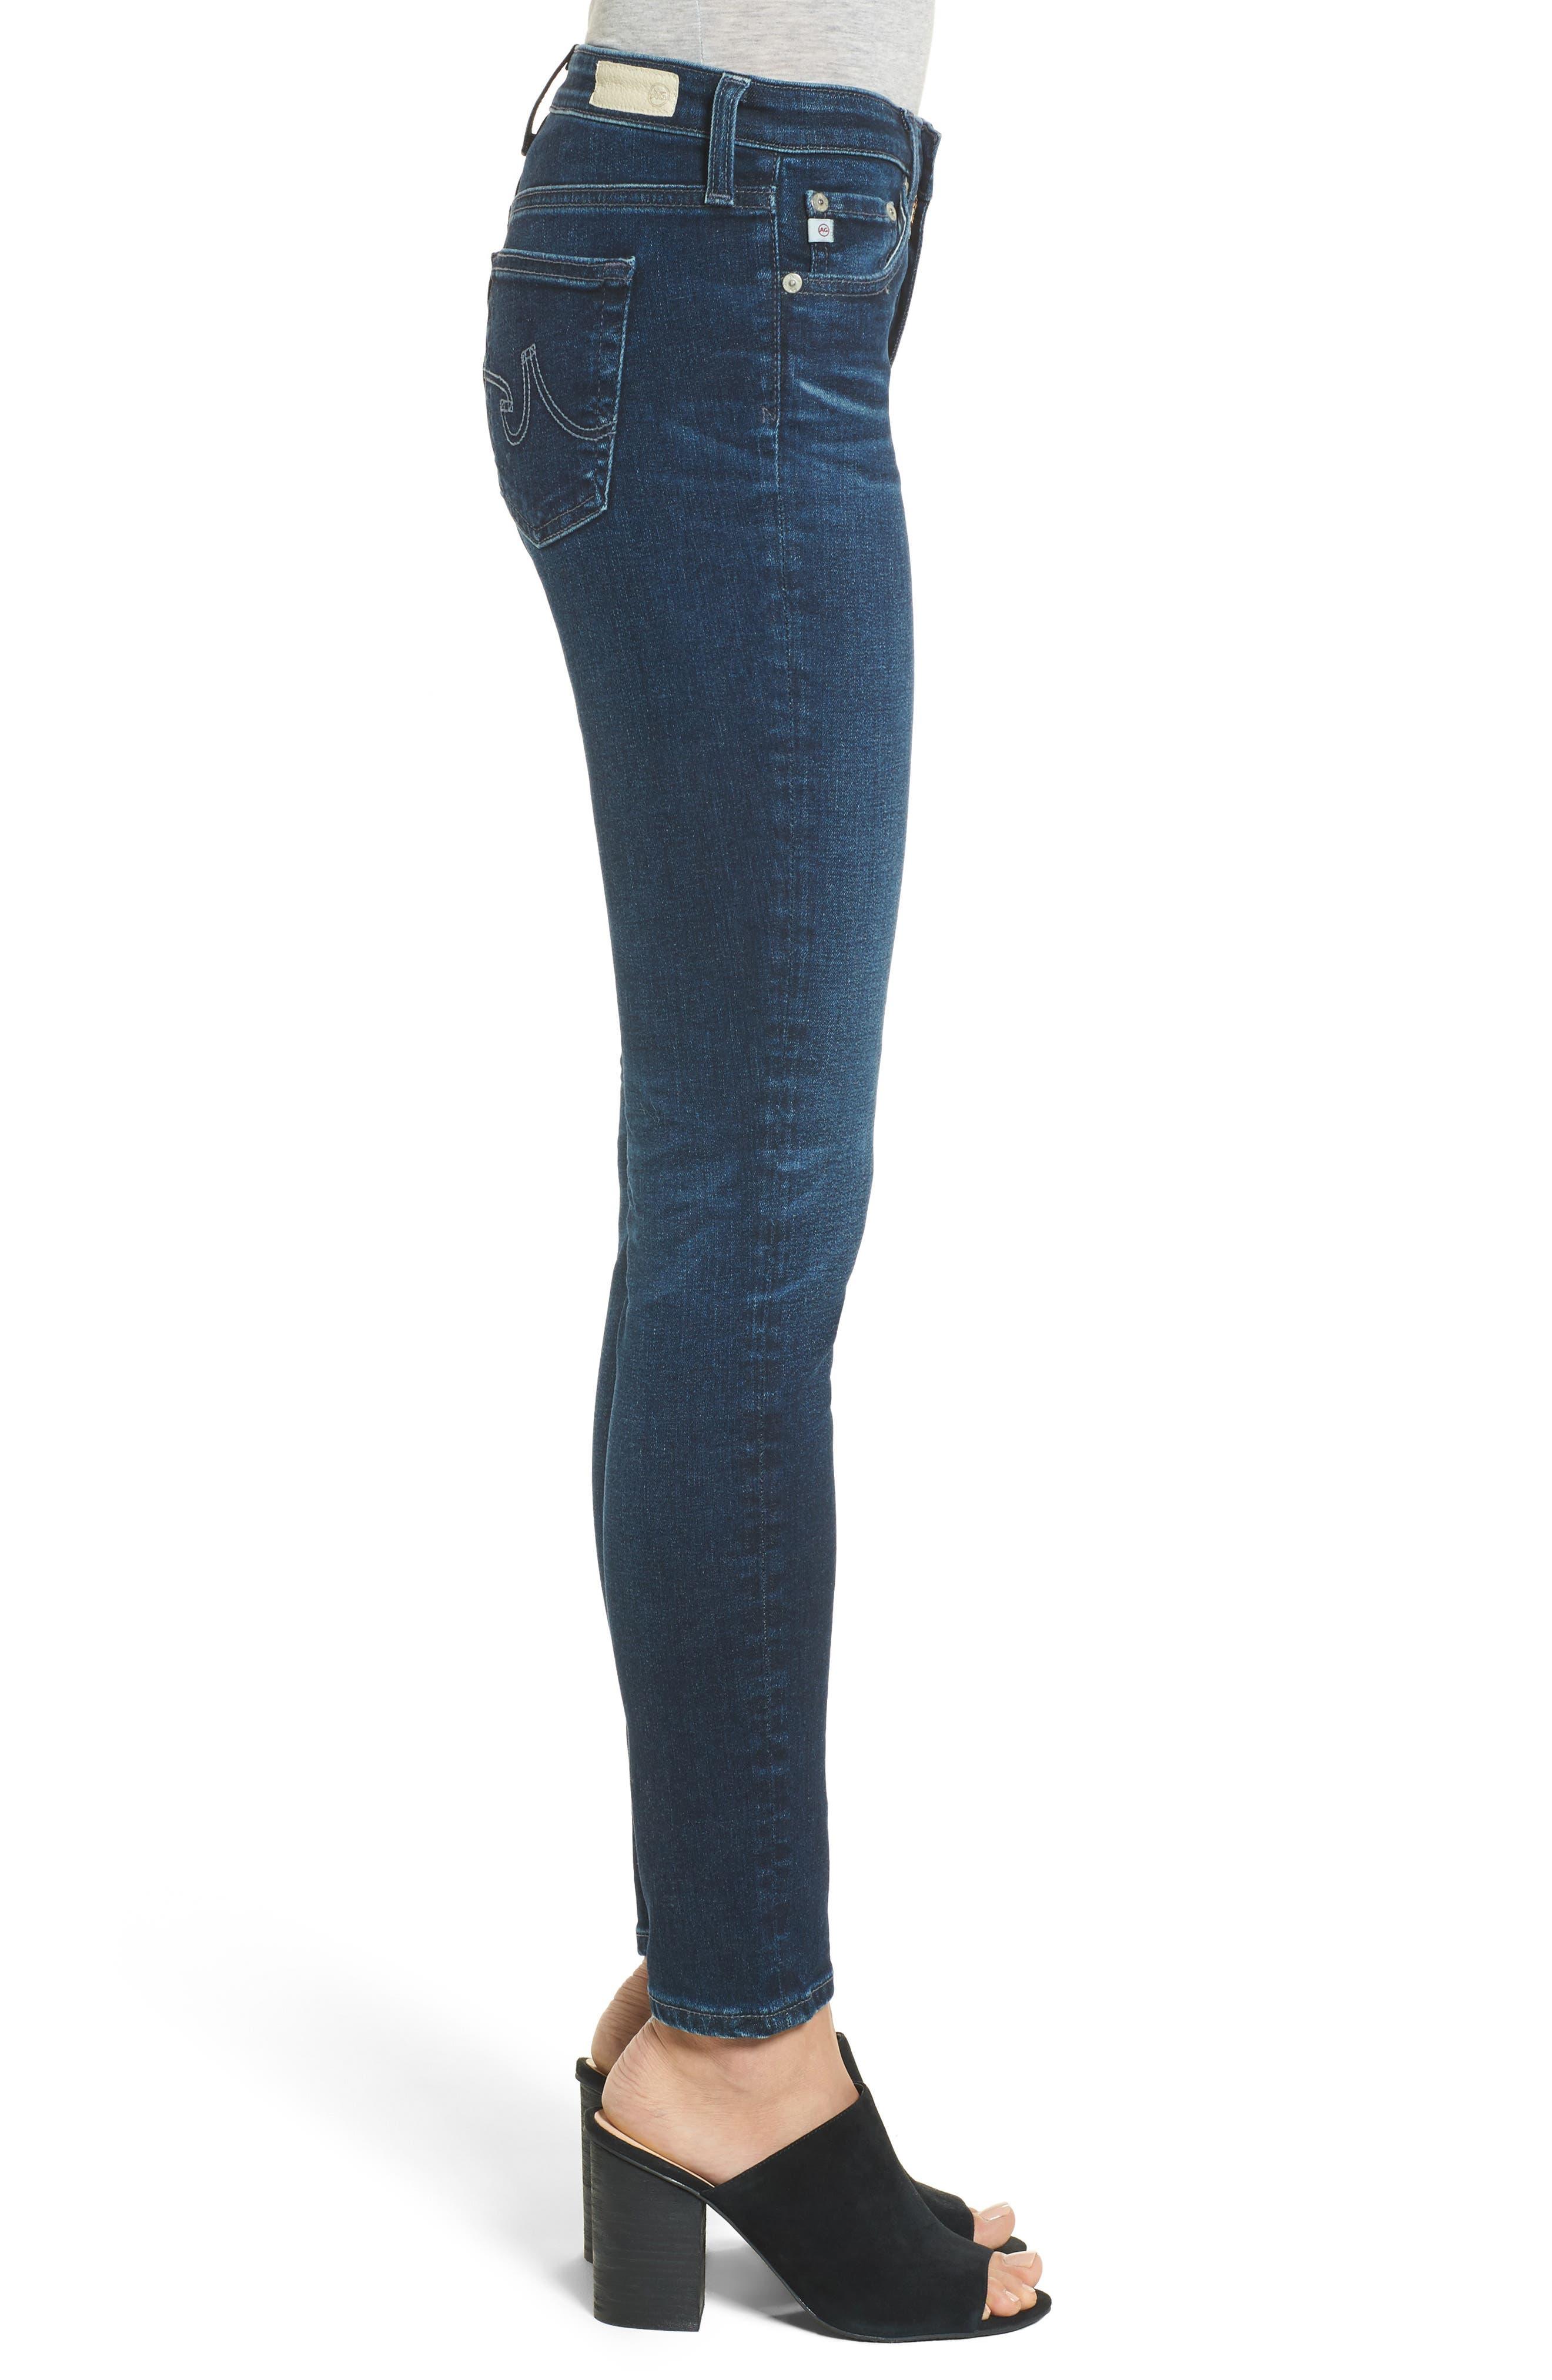 Alternate Image 3  - AG The Legging Ankle Super Skinny Jeans (04 Years Rapid)